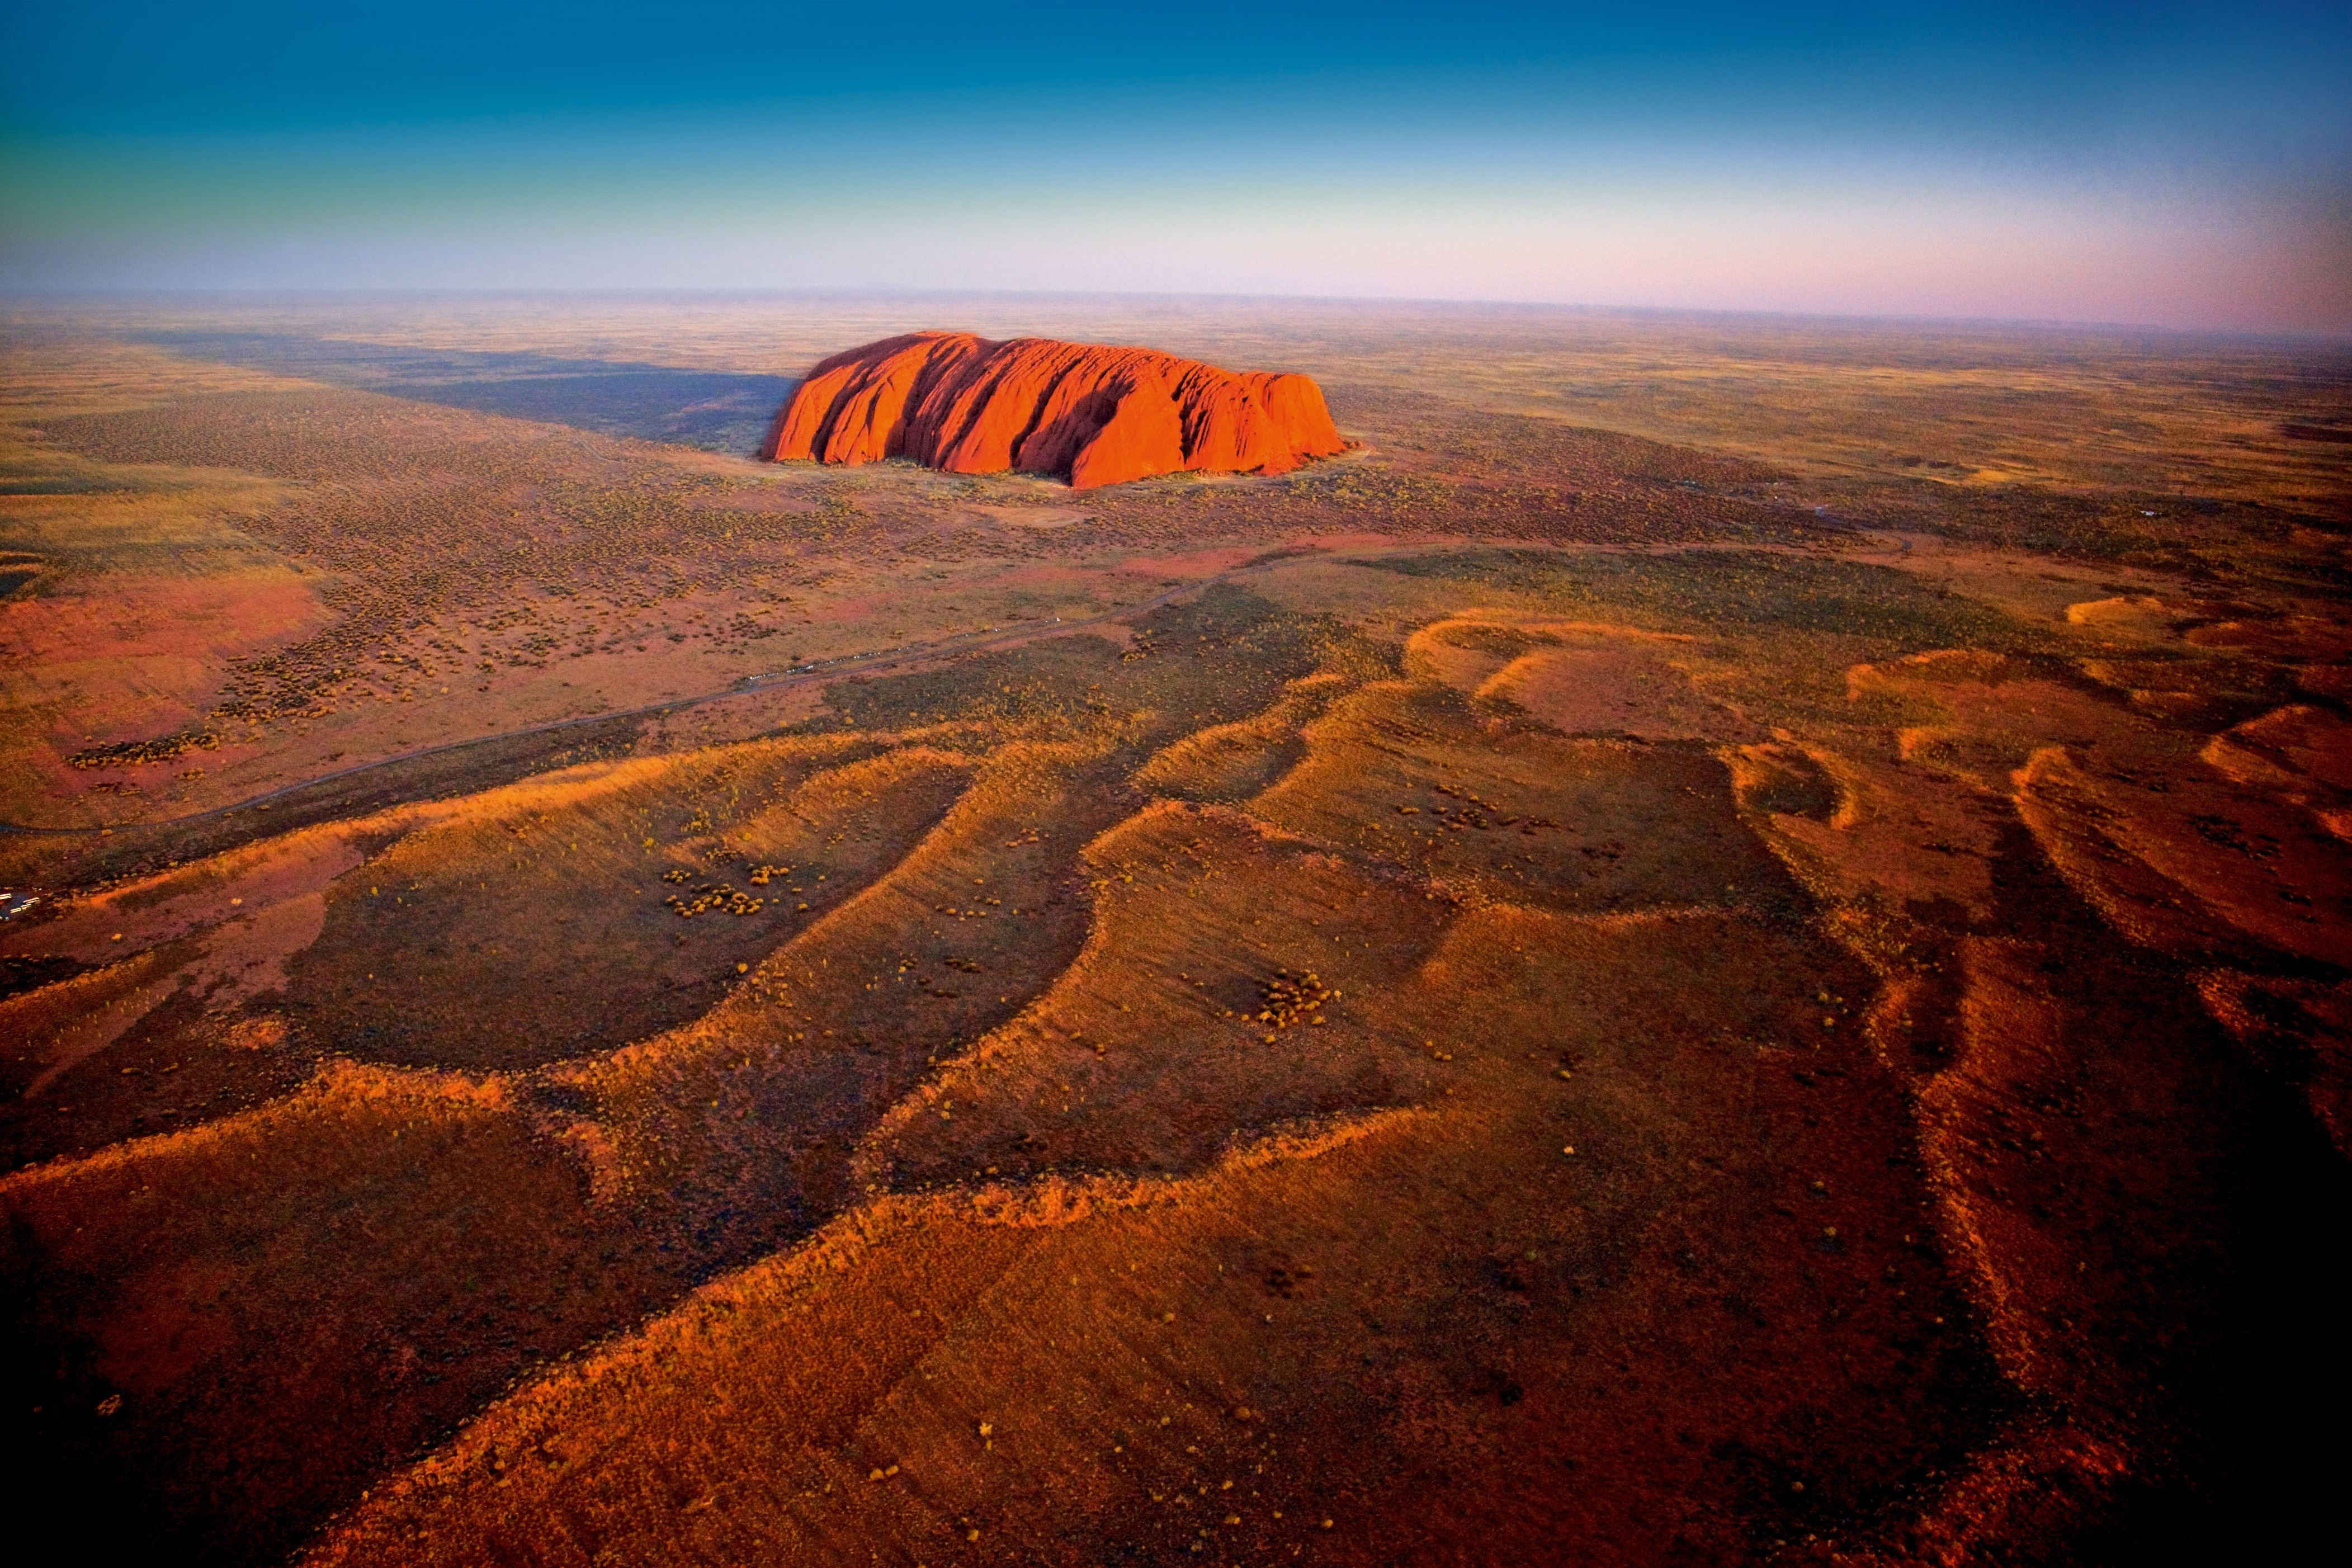 Slide 31 of 41: Australia, Northern Territory, Ayers Rock, Uluru, Oceania, South Pacific Ocean, Uluru-Kata Tjuta National Park, Australasia, Aerial photo